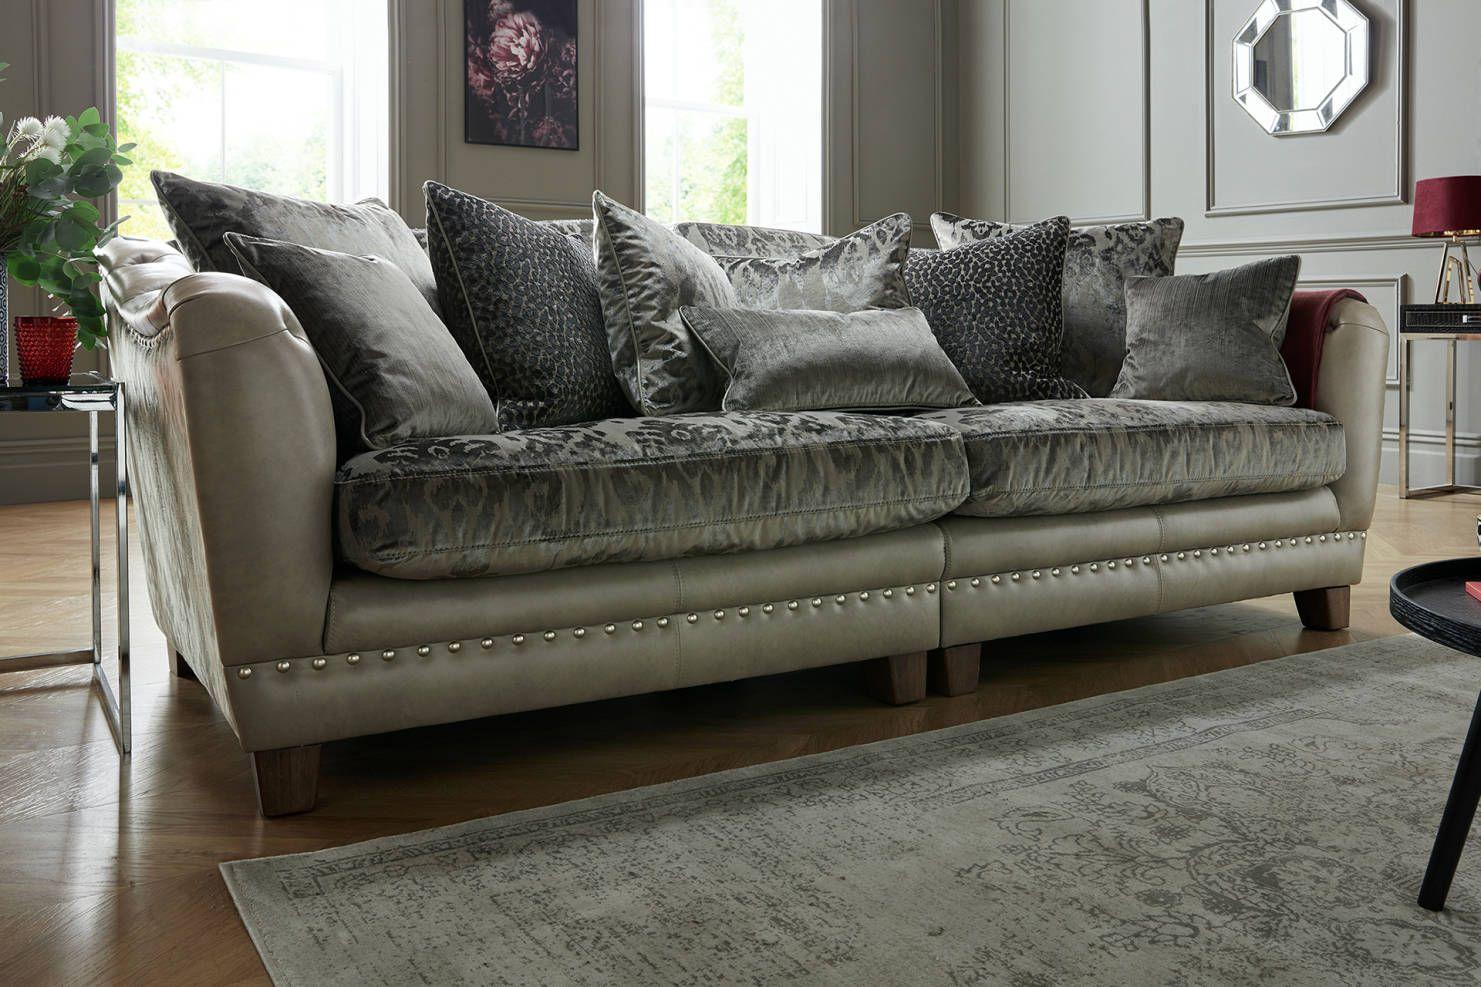 Hermes Sofology Leather Sofa Furniture Dream Sofas